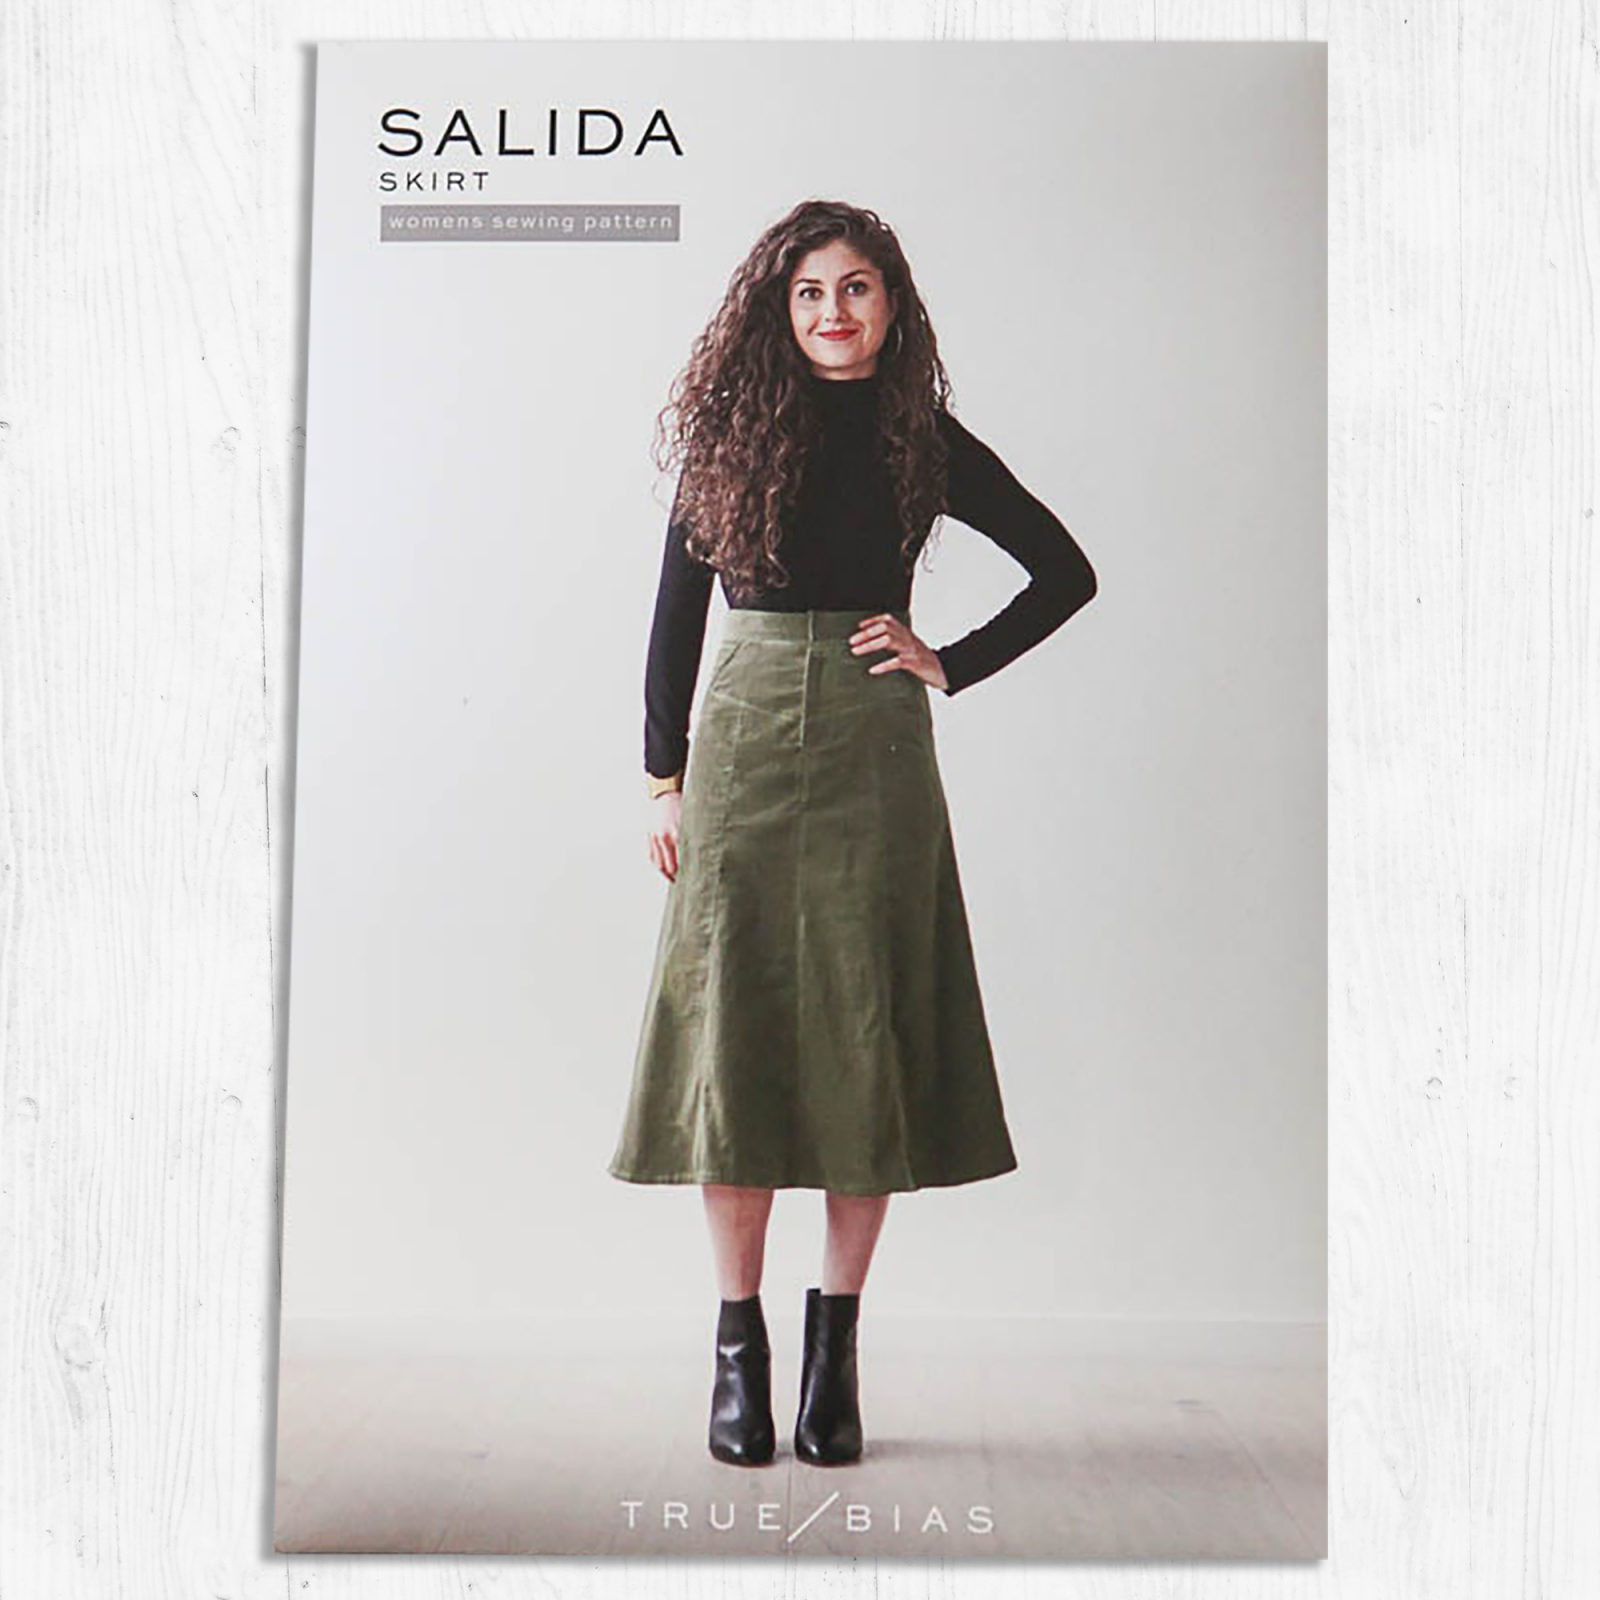 True Bias - Salida Skirt